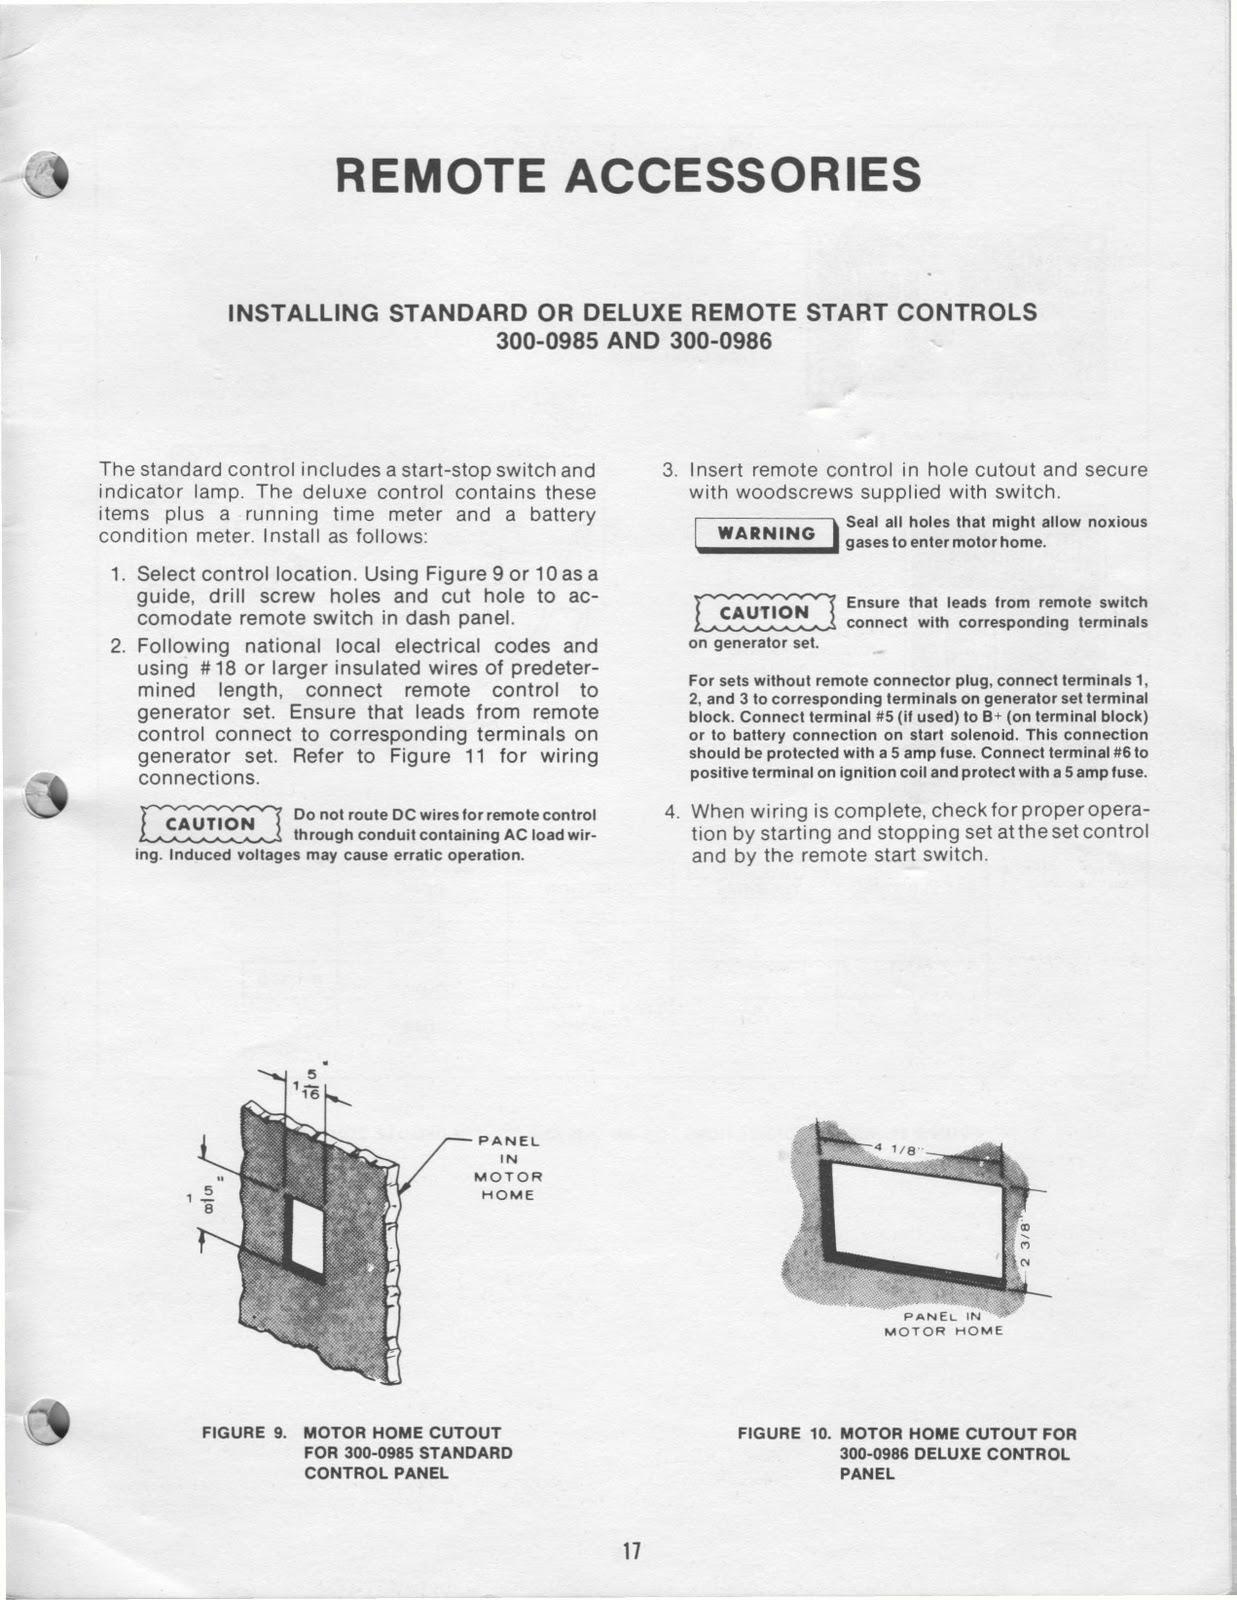 Mins Onan Kw Wiring Diagram on onan 6.5 parts, onan 6.5 generator, onan 6.5 cover,